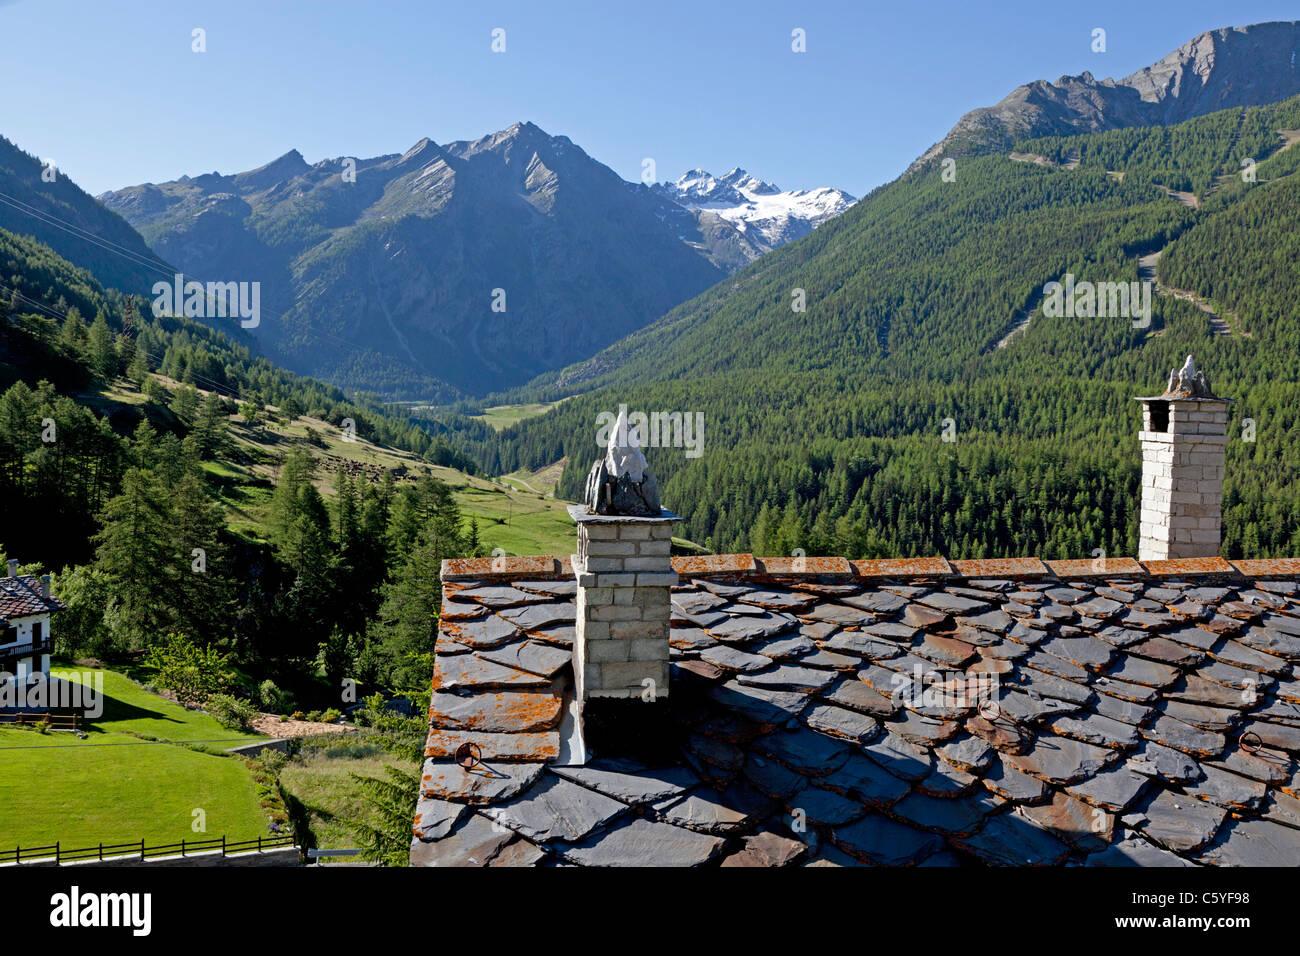 Chimney stacks on a roof covered with slates (Gimilan - Italy). Souches de cheminées sur un toit de lauzes - Stock Image